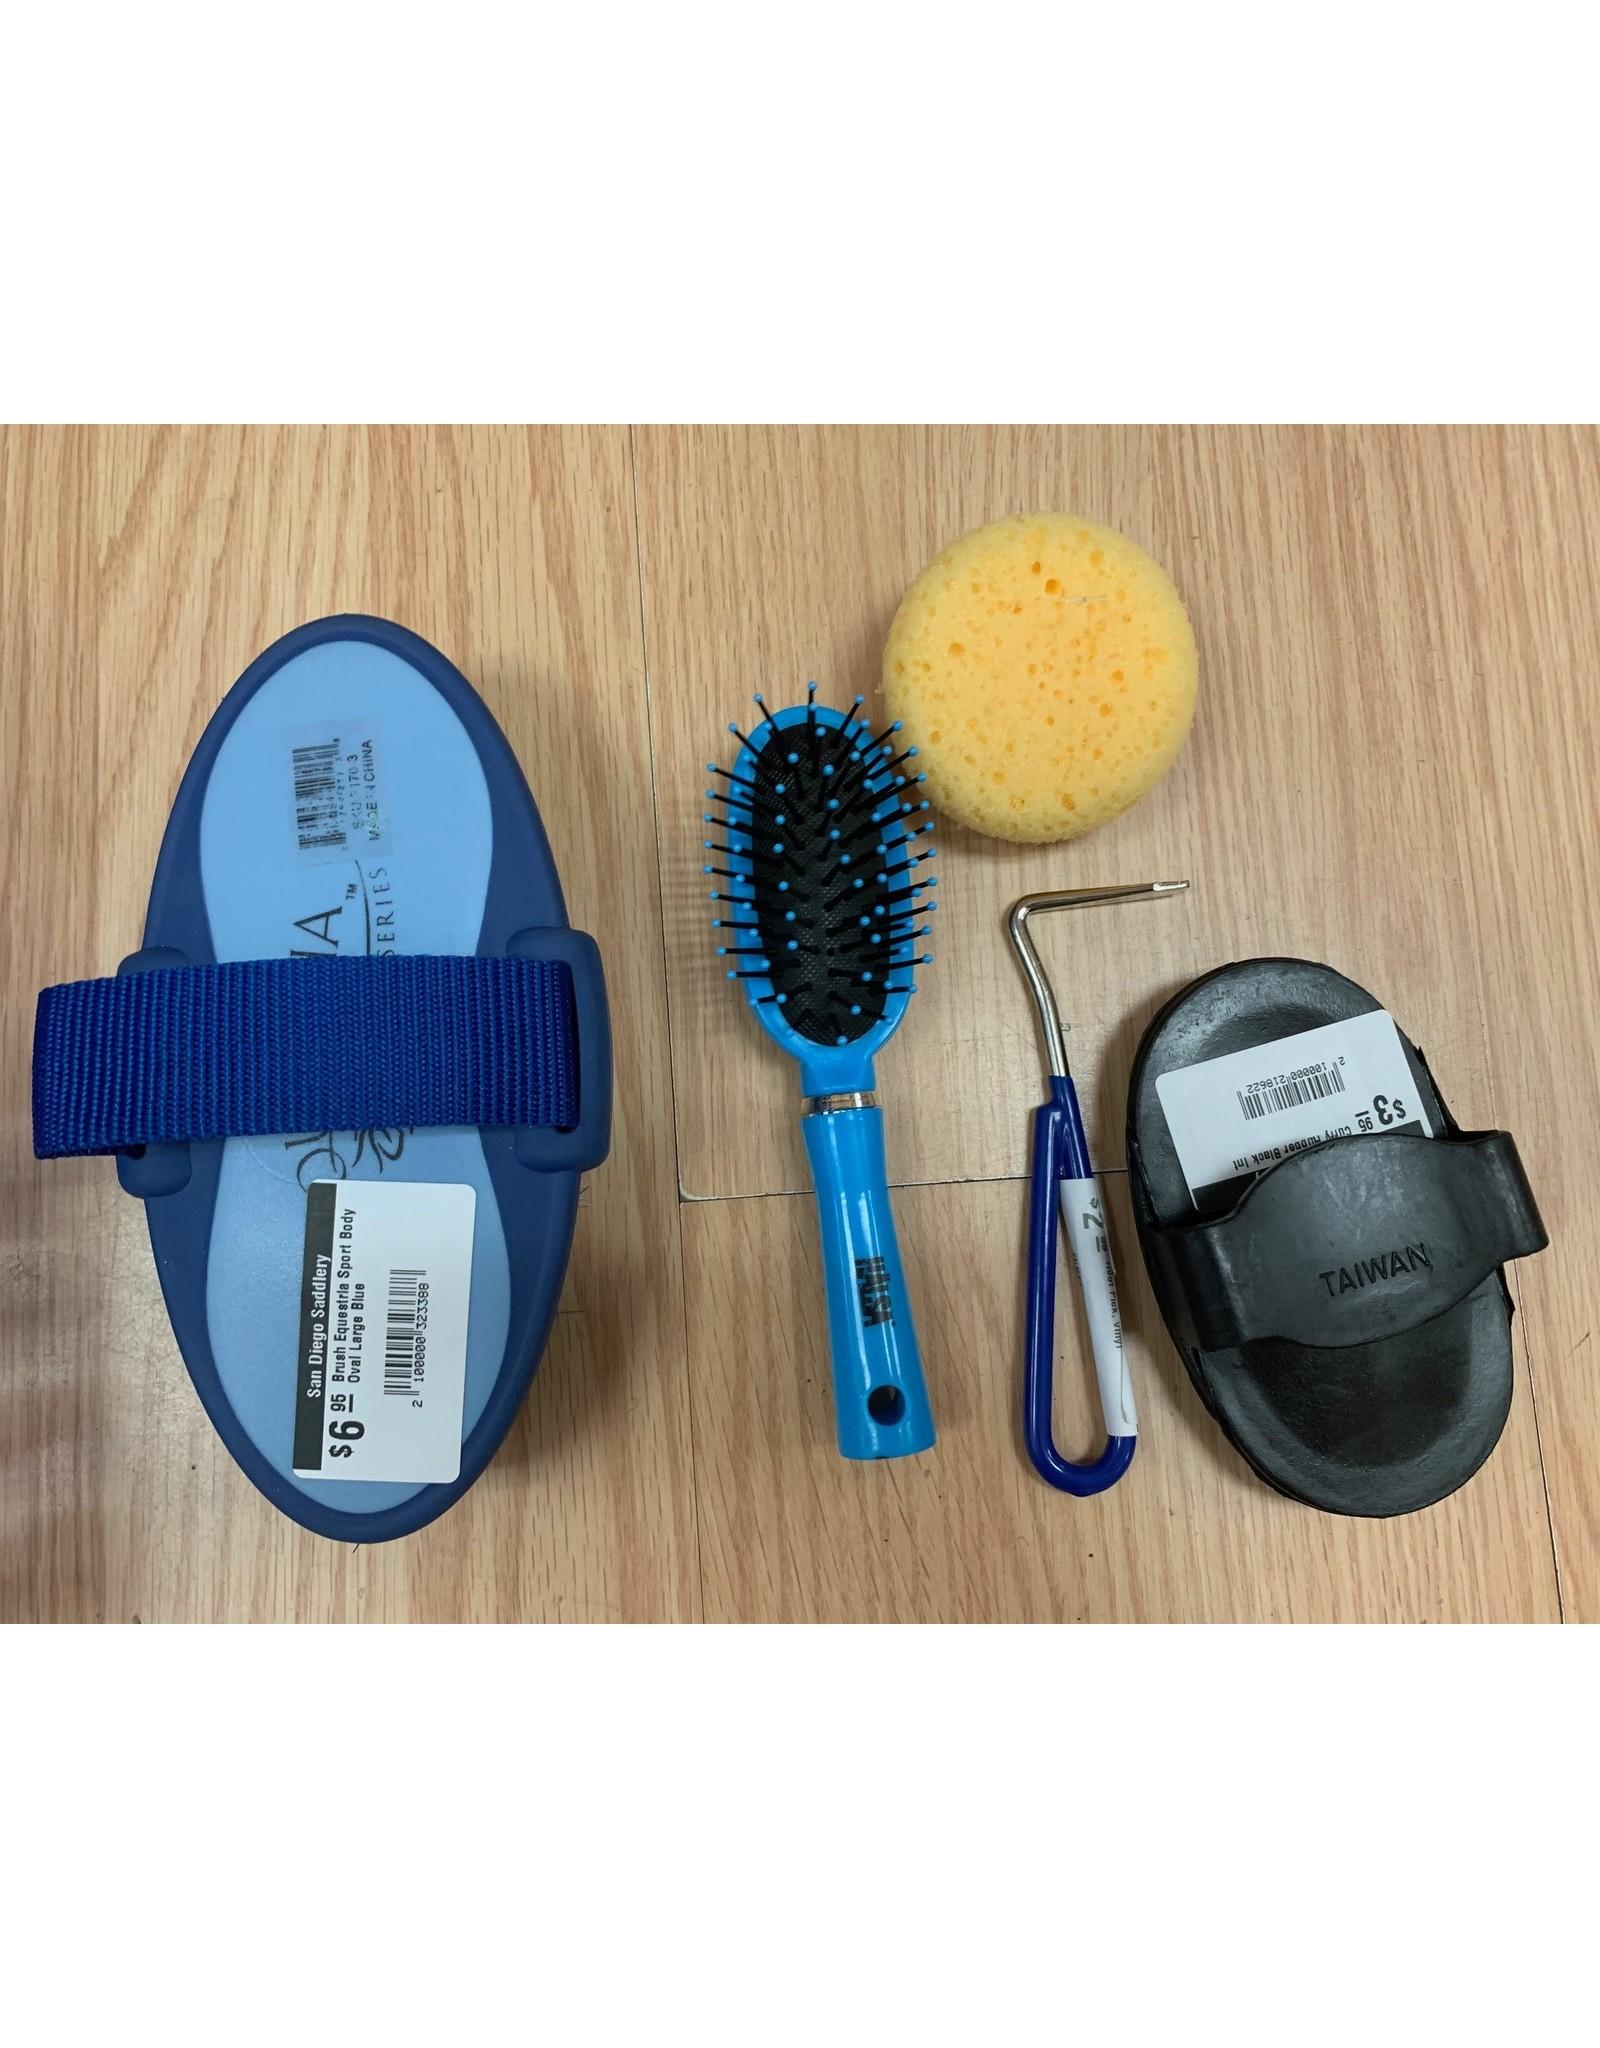 Starter Grooming Kit 6 Piece